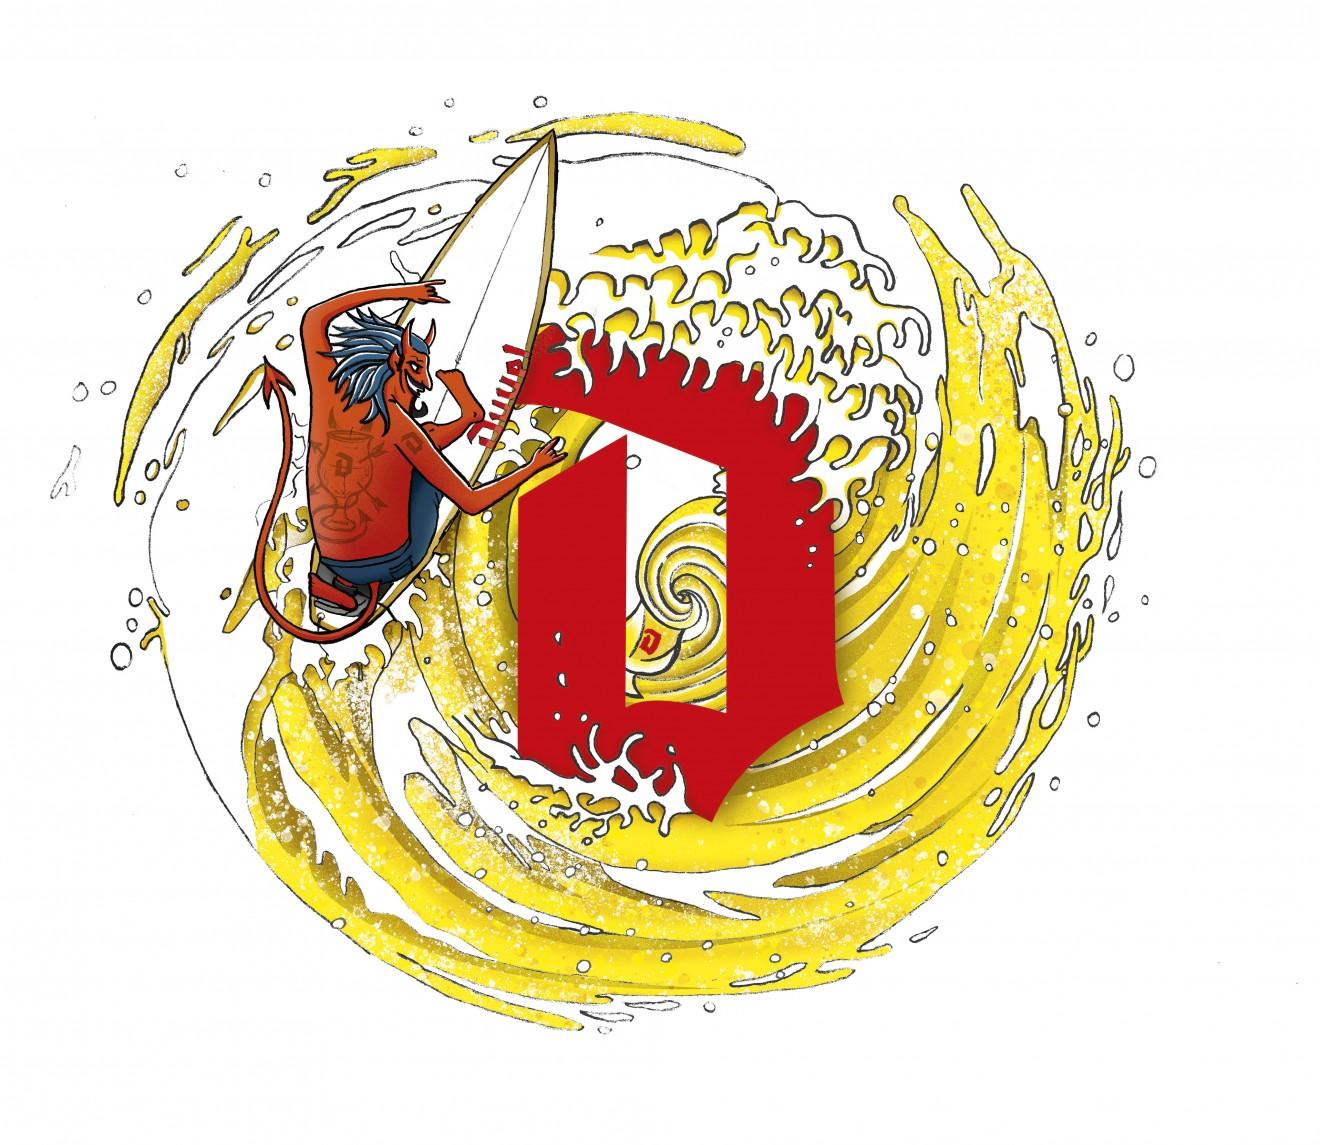 Quatre Mains package design - tornado, beer, swirl, surfer, kobe de keyzer